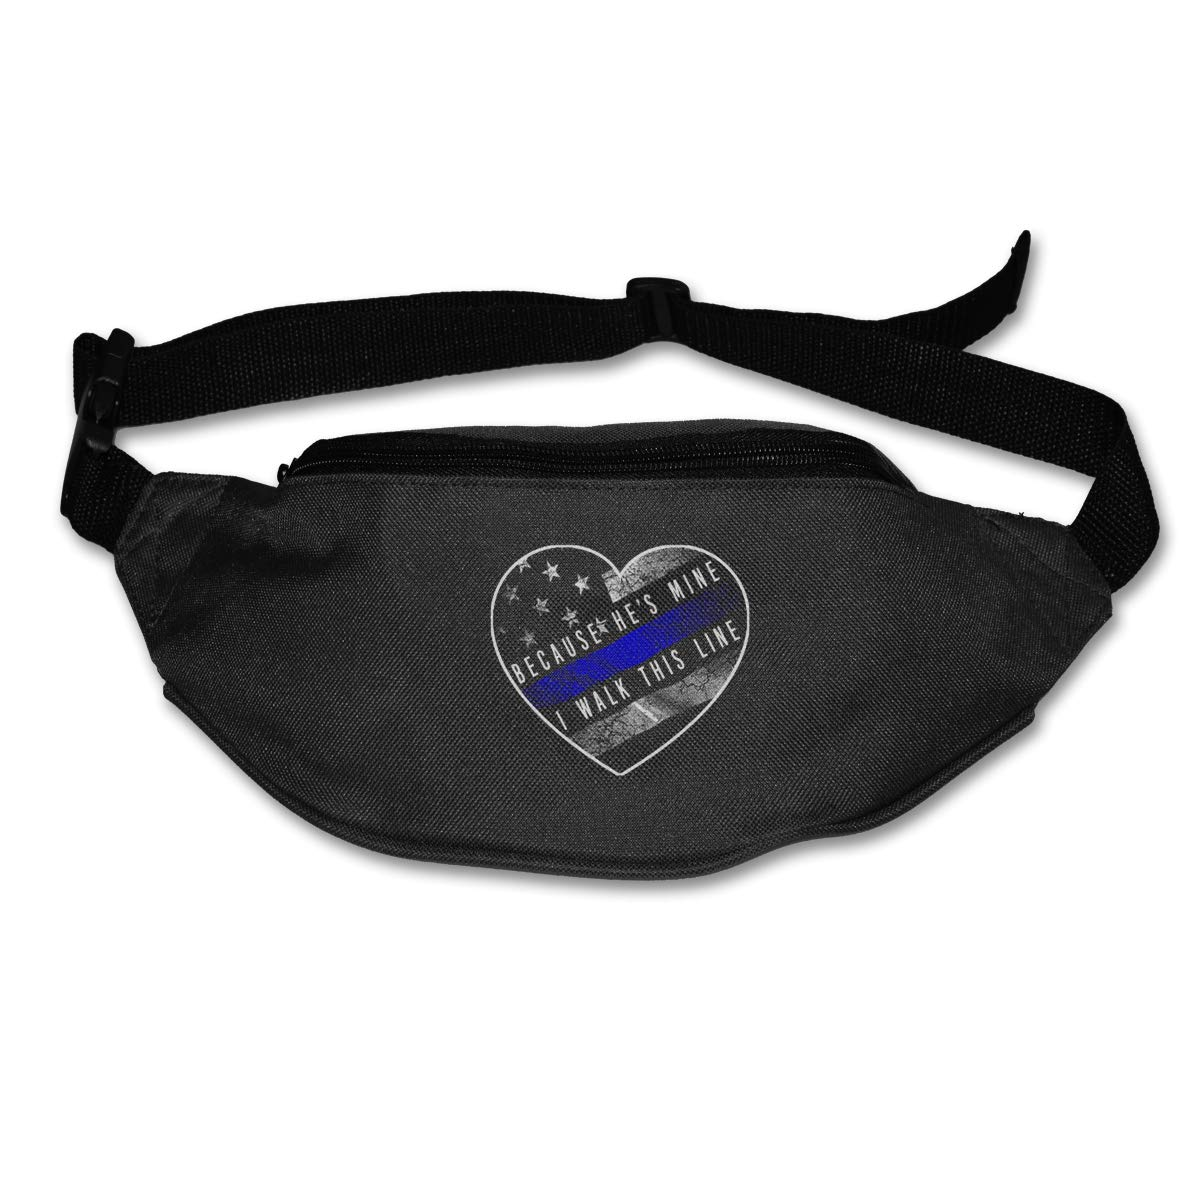 Trust Police This Line Sport Waist Bag Fanny Pack Adjustable For Hike